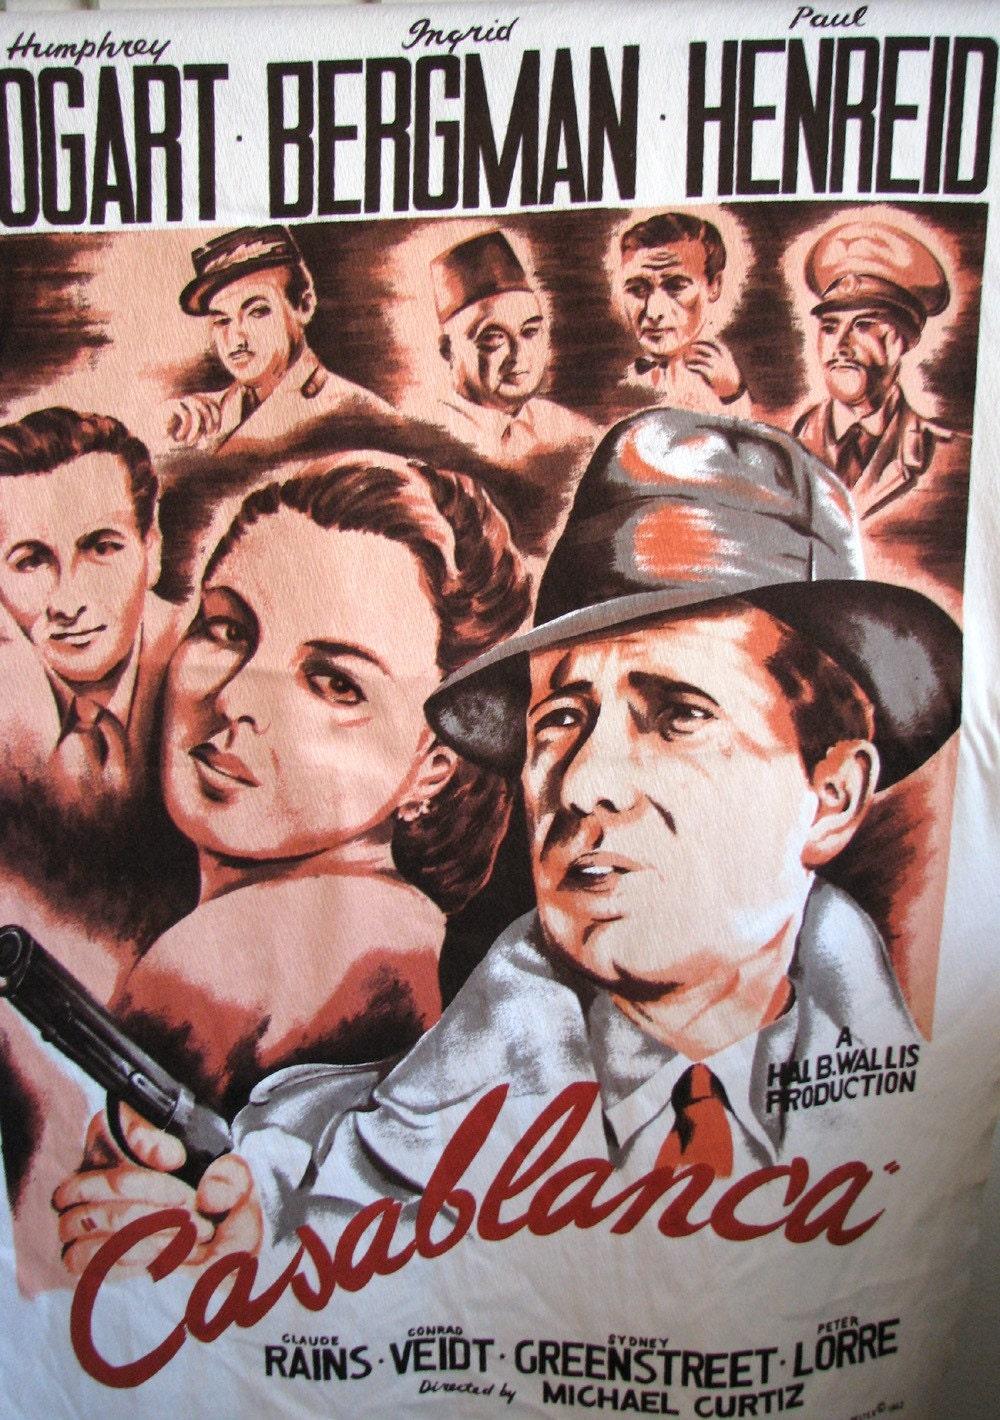 Casablanca Humphrey Bogart Ingrid Bergman Fabric Panel